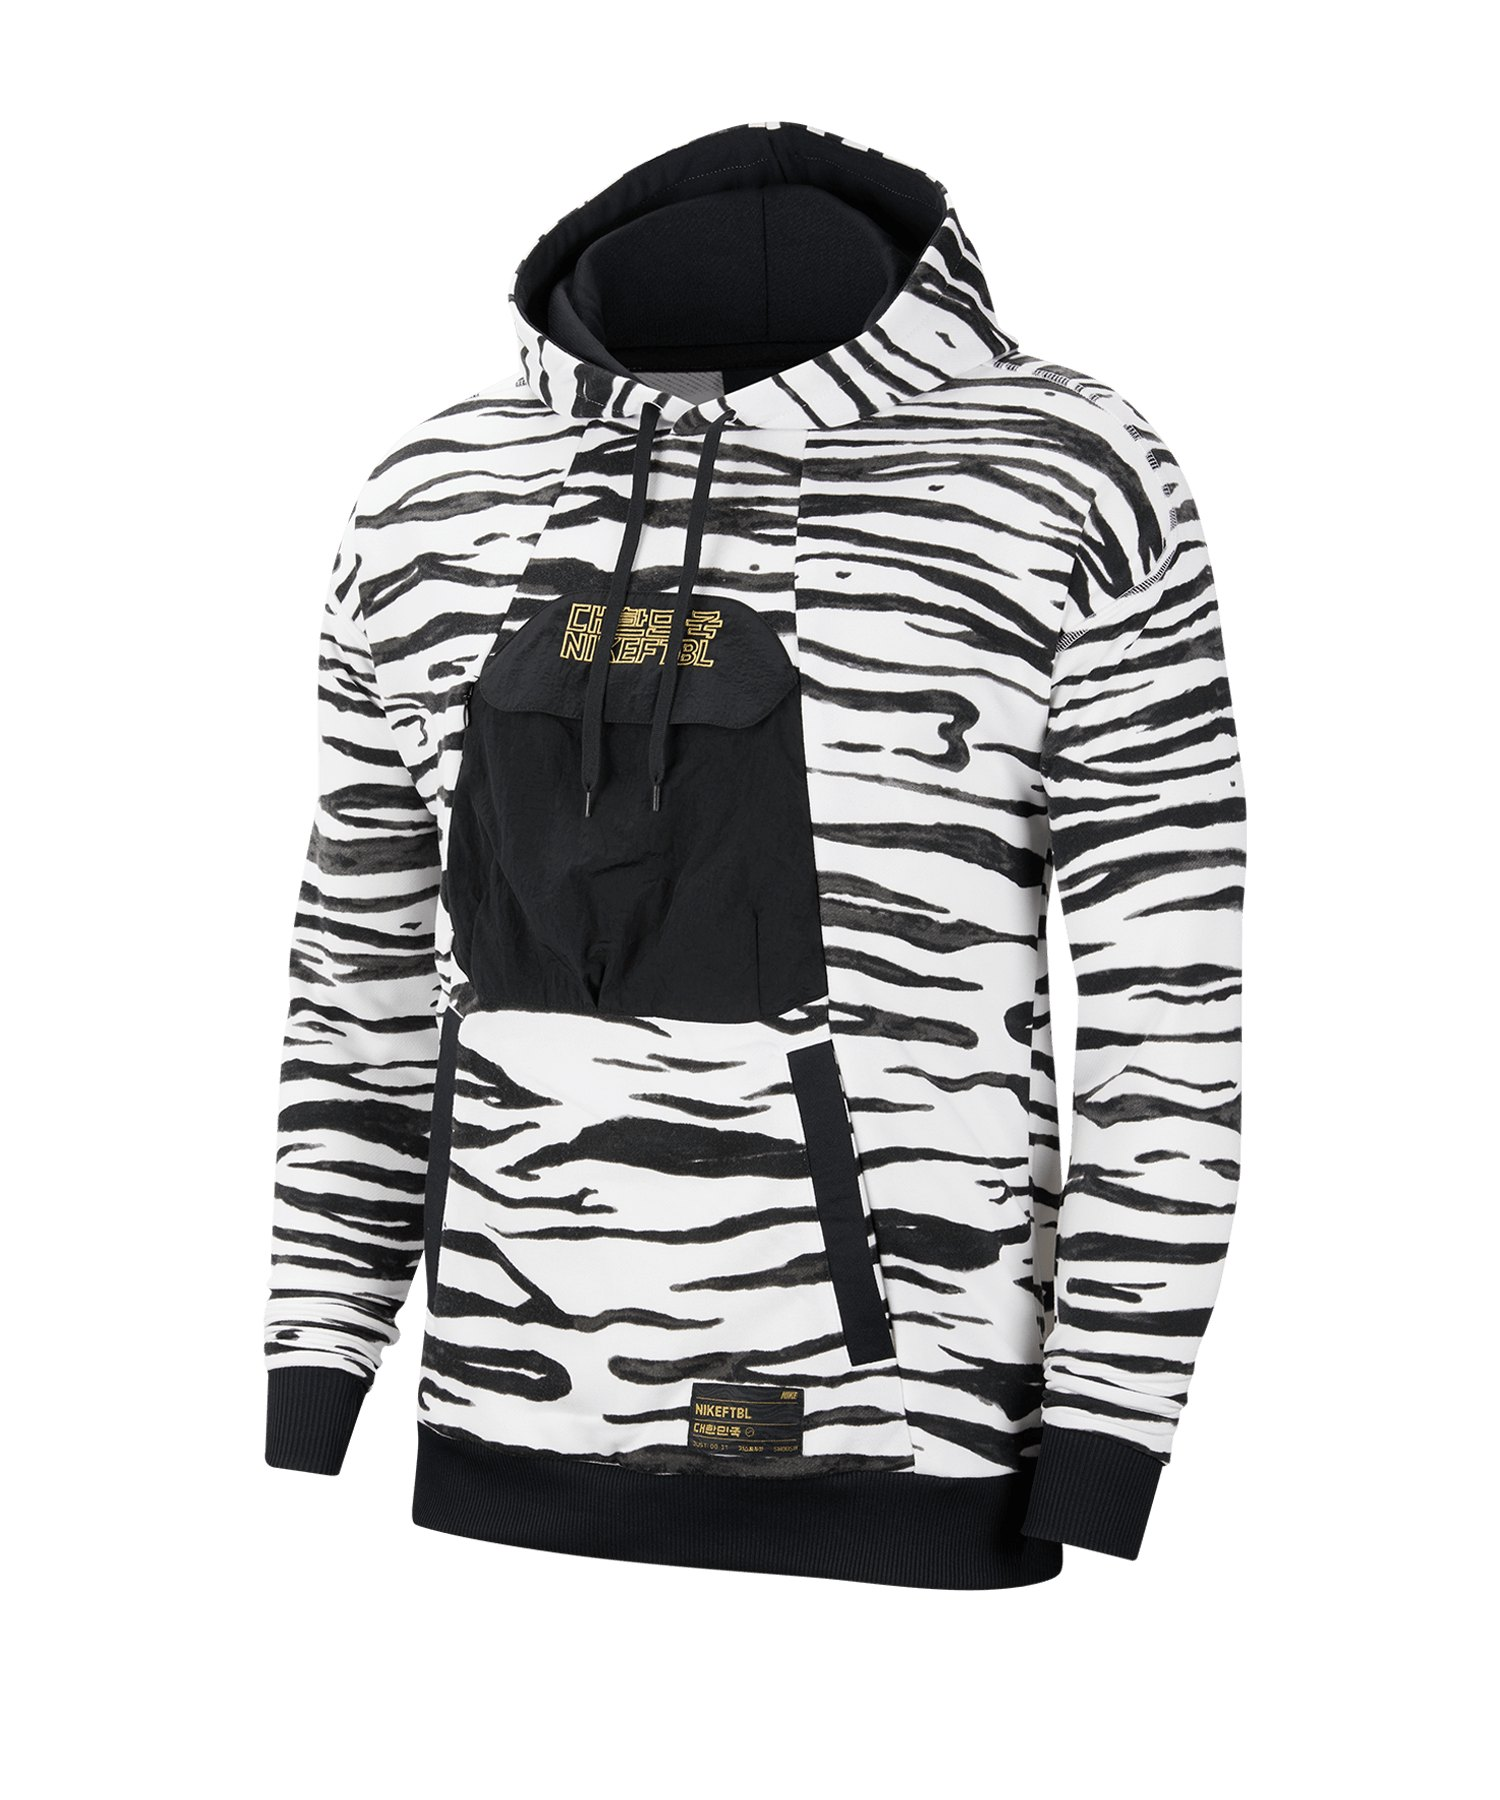 Nike Südkorea Kapuzensweatshirt Weiss Schwarz F100 - weiss